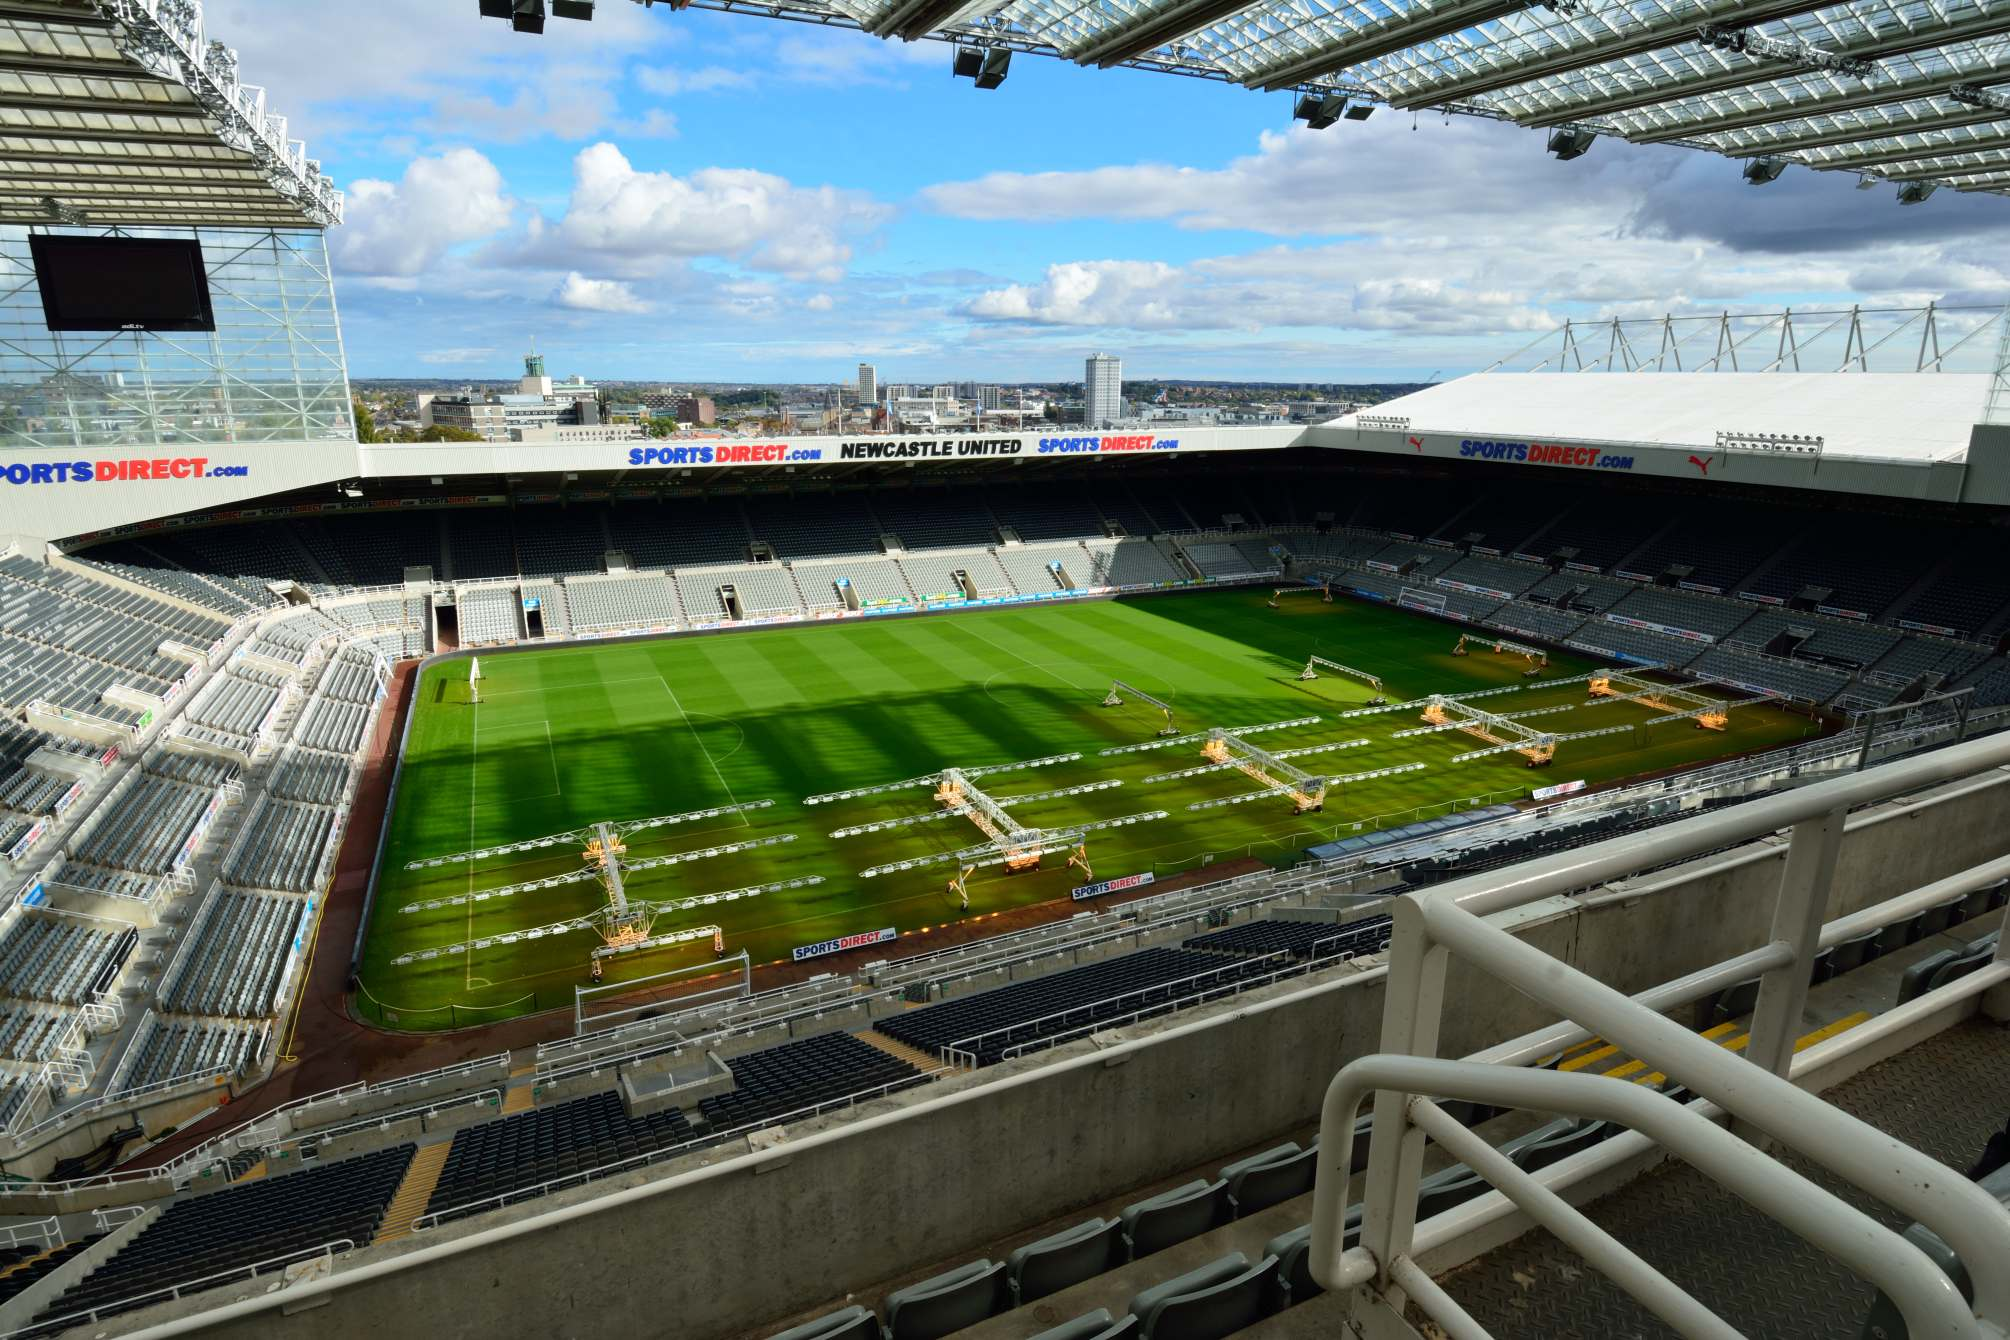 nufc tours1 Newcastle United Stadium Tours for Fans